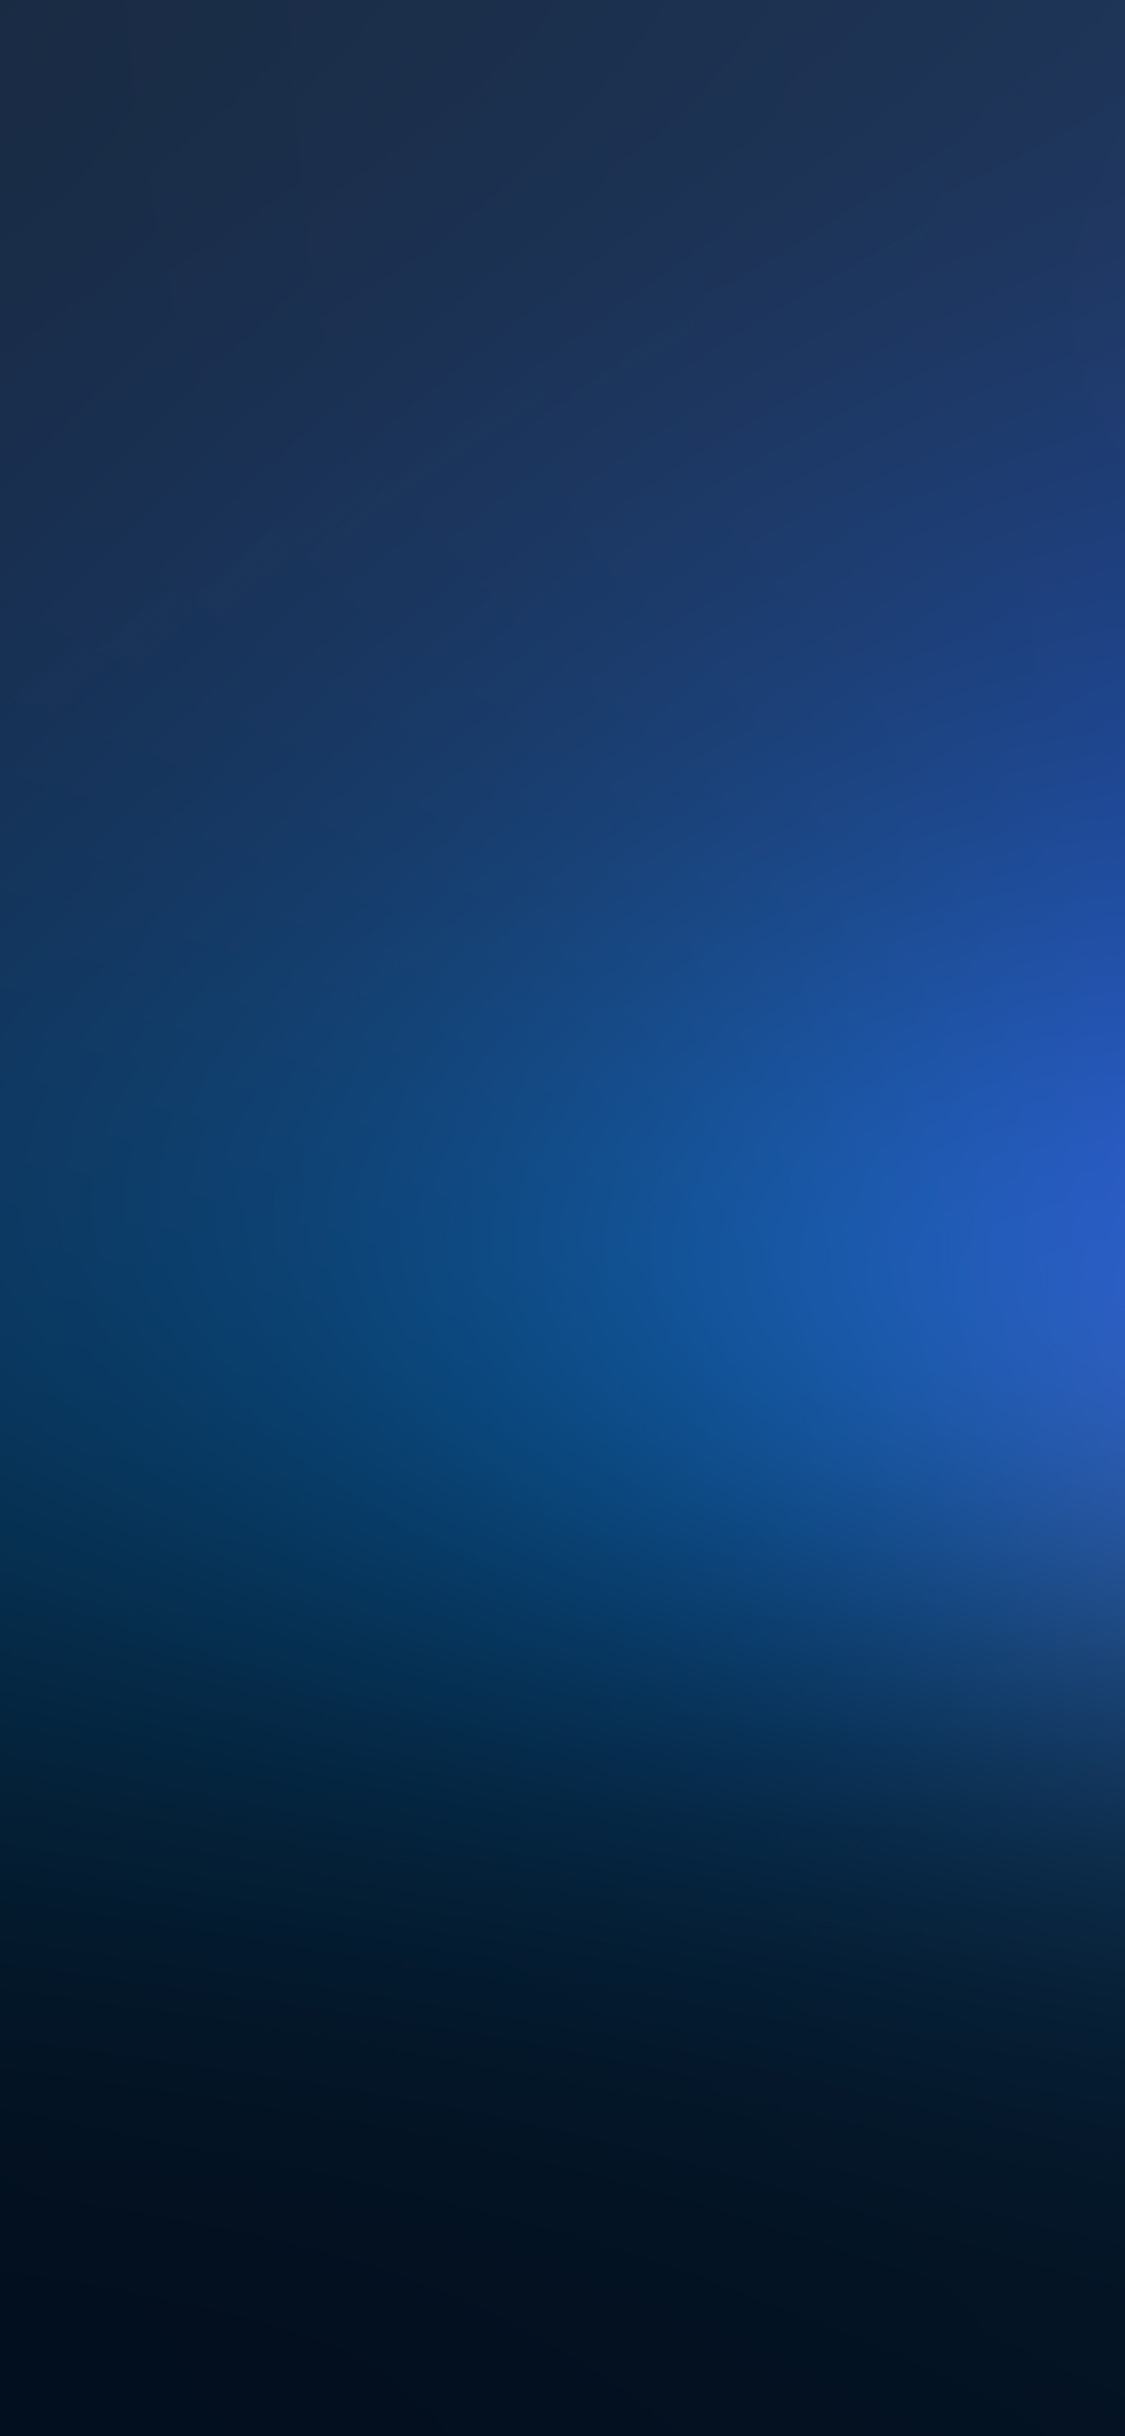 iPhoneXpapers.com-Apple-iPhone-wallpaper-si40-blue-saturday-night-live-gradation-blur